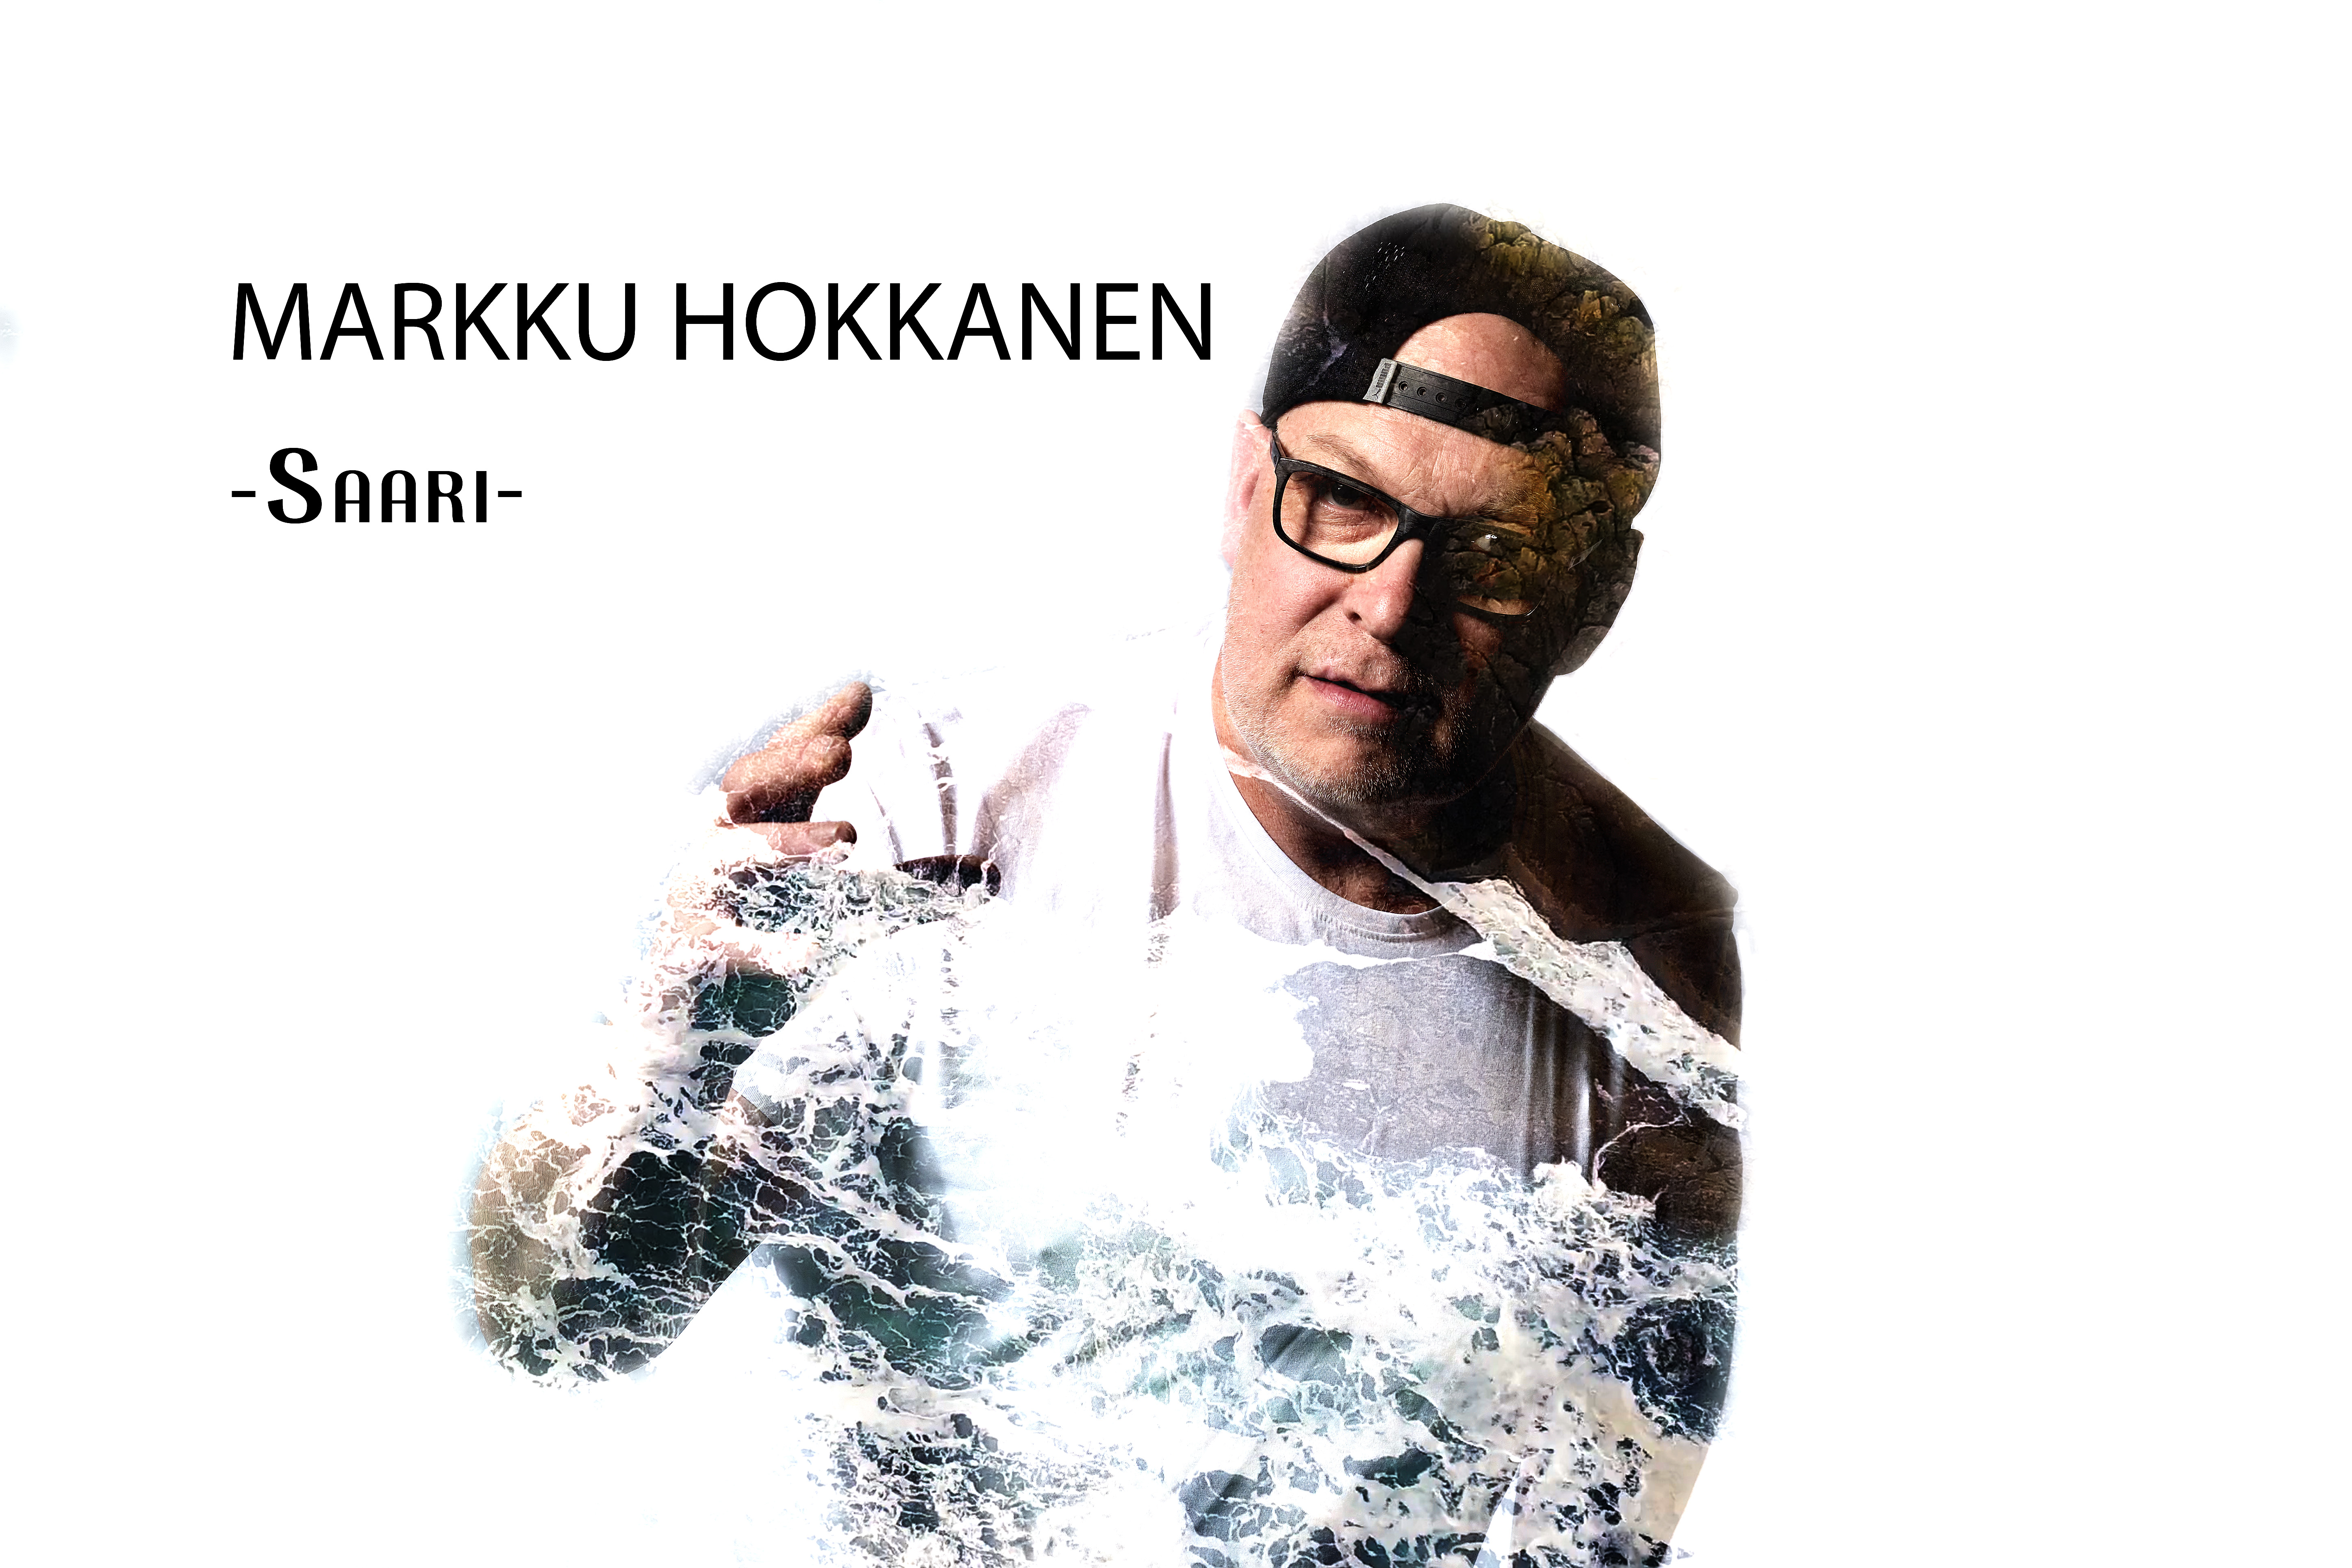 Markku Hokkanen